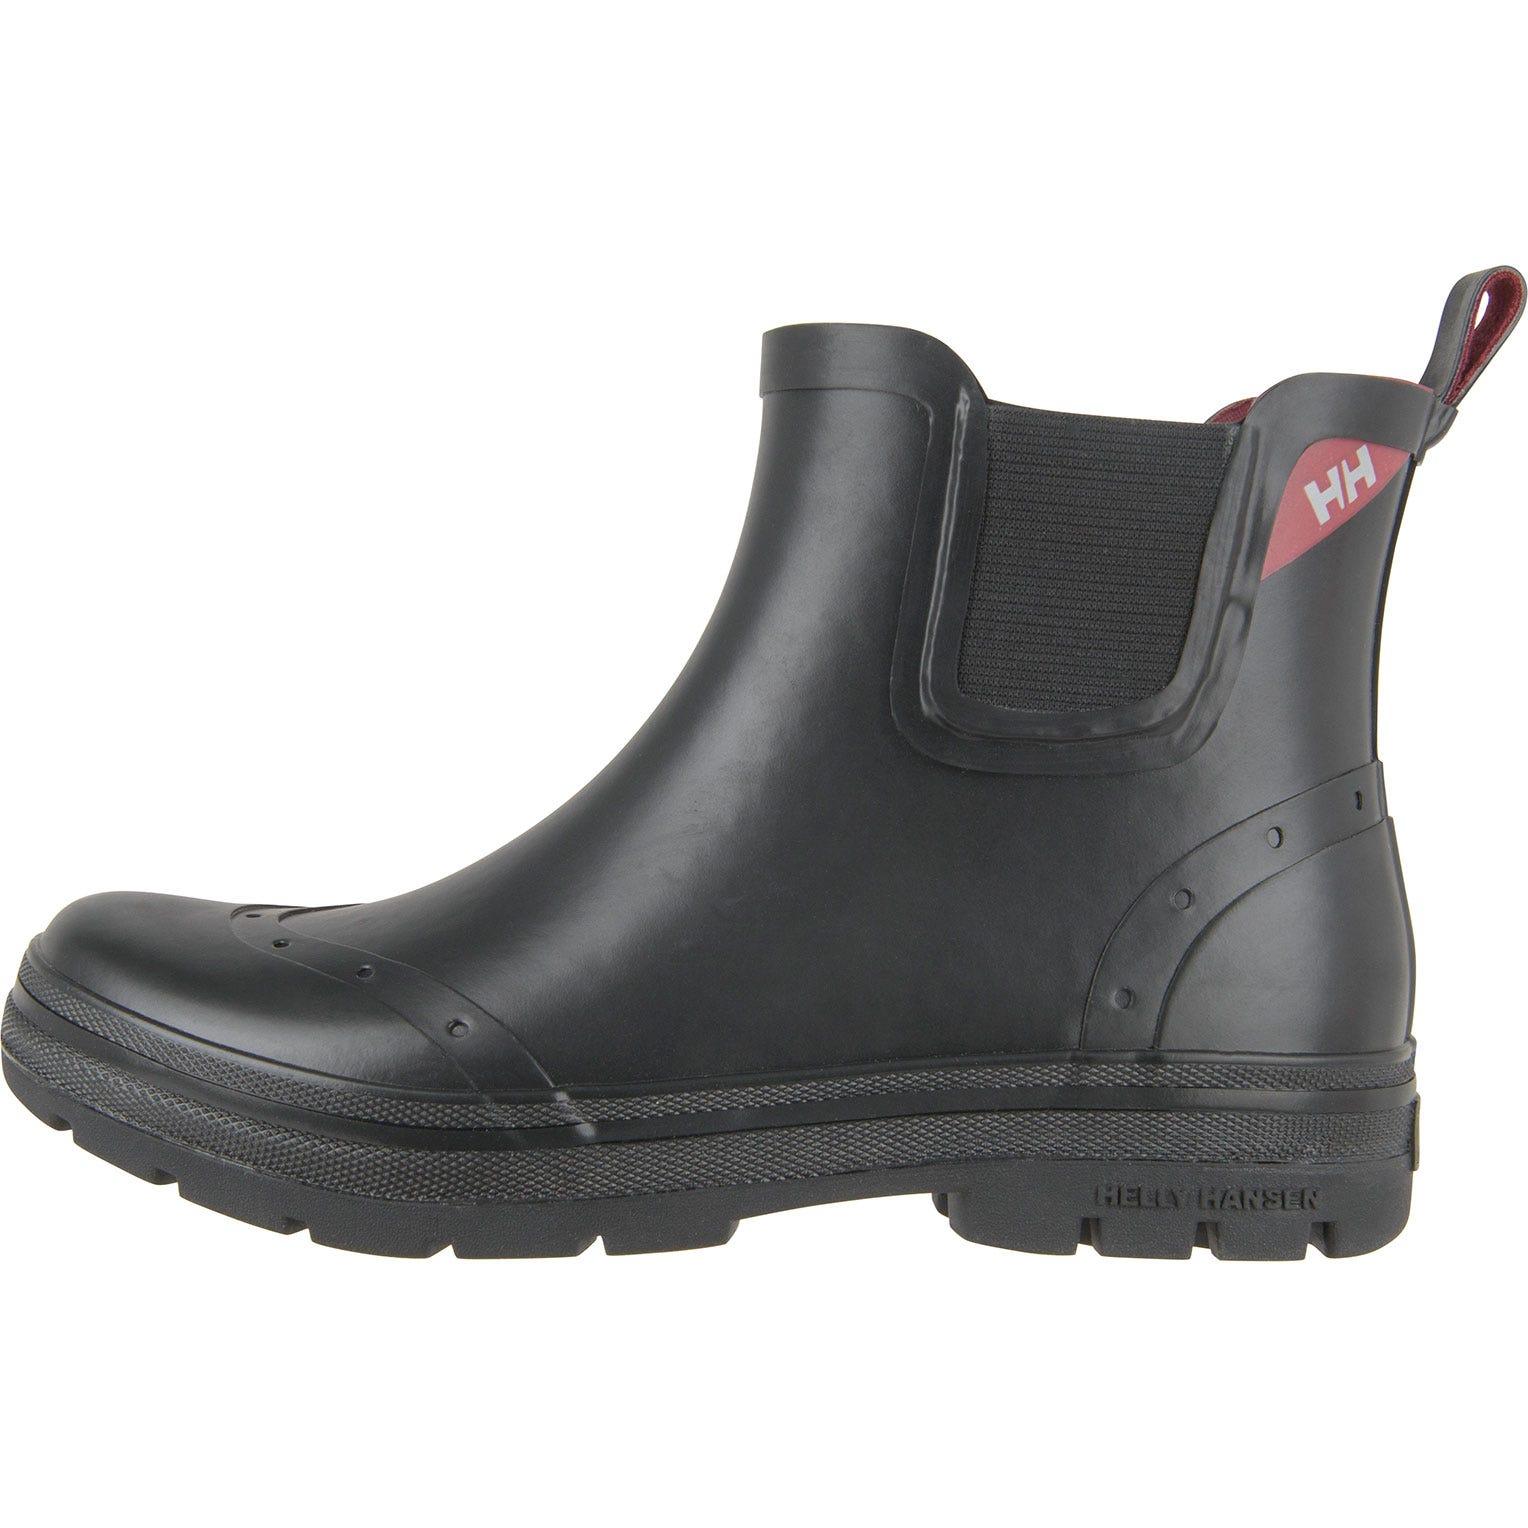 Helly Hansen W Karoline Womens Rubber Boot Black 37/6